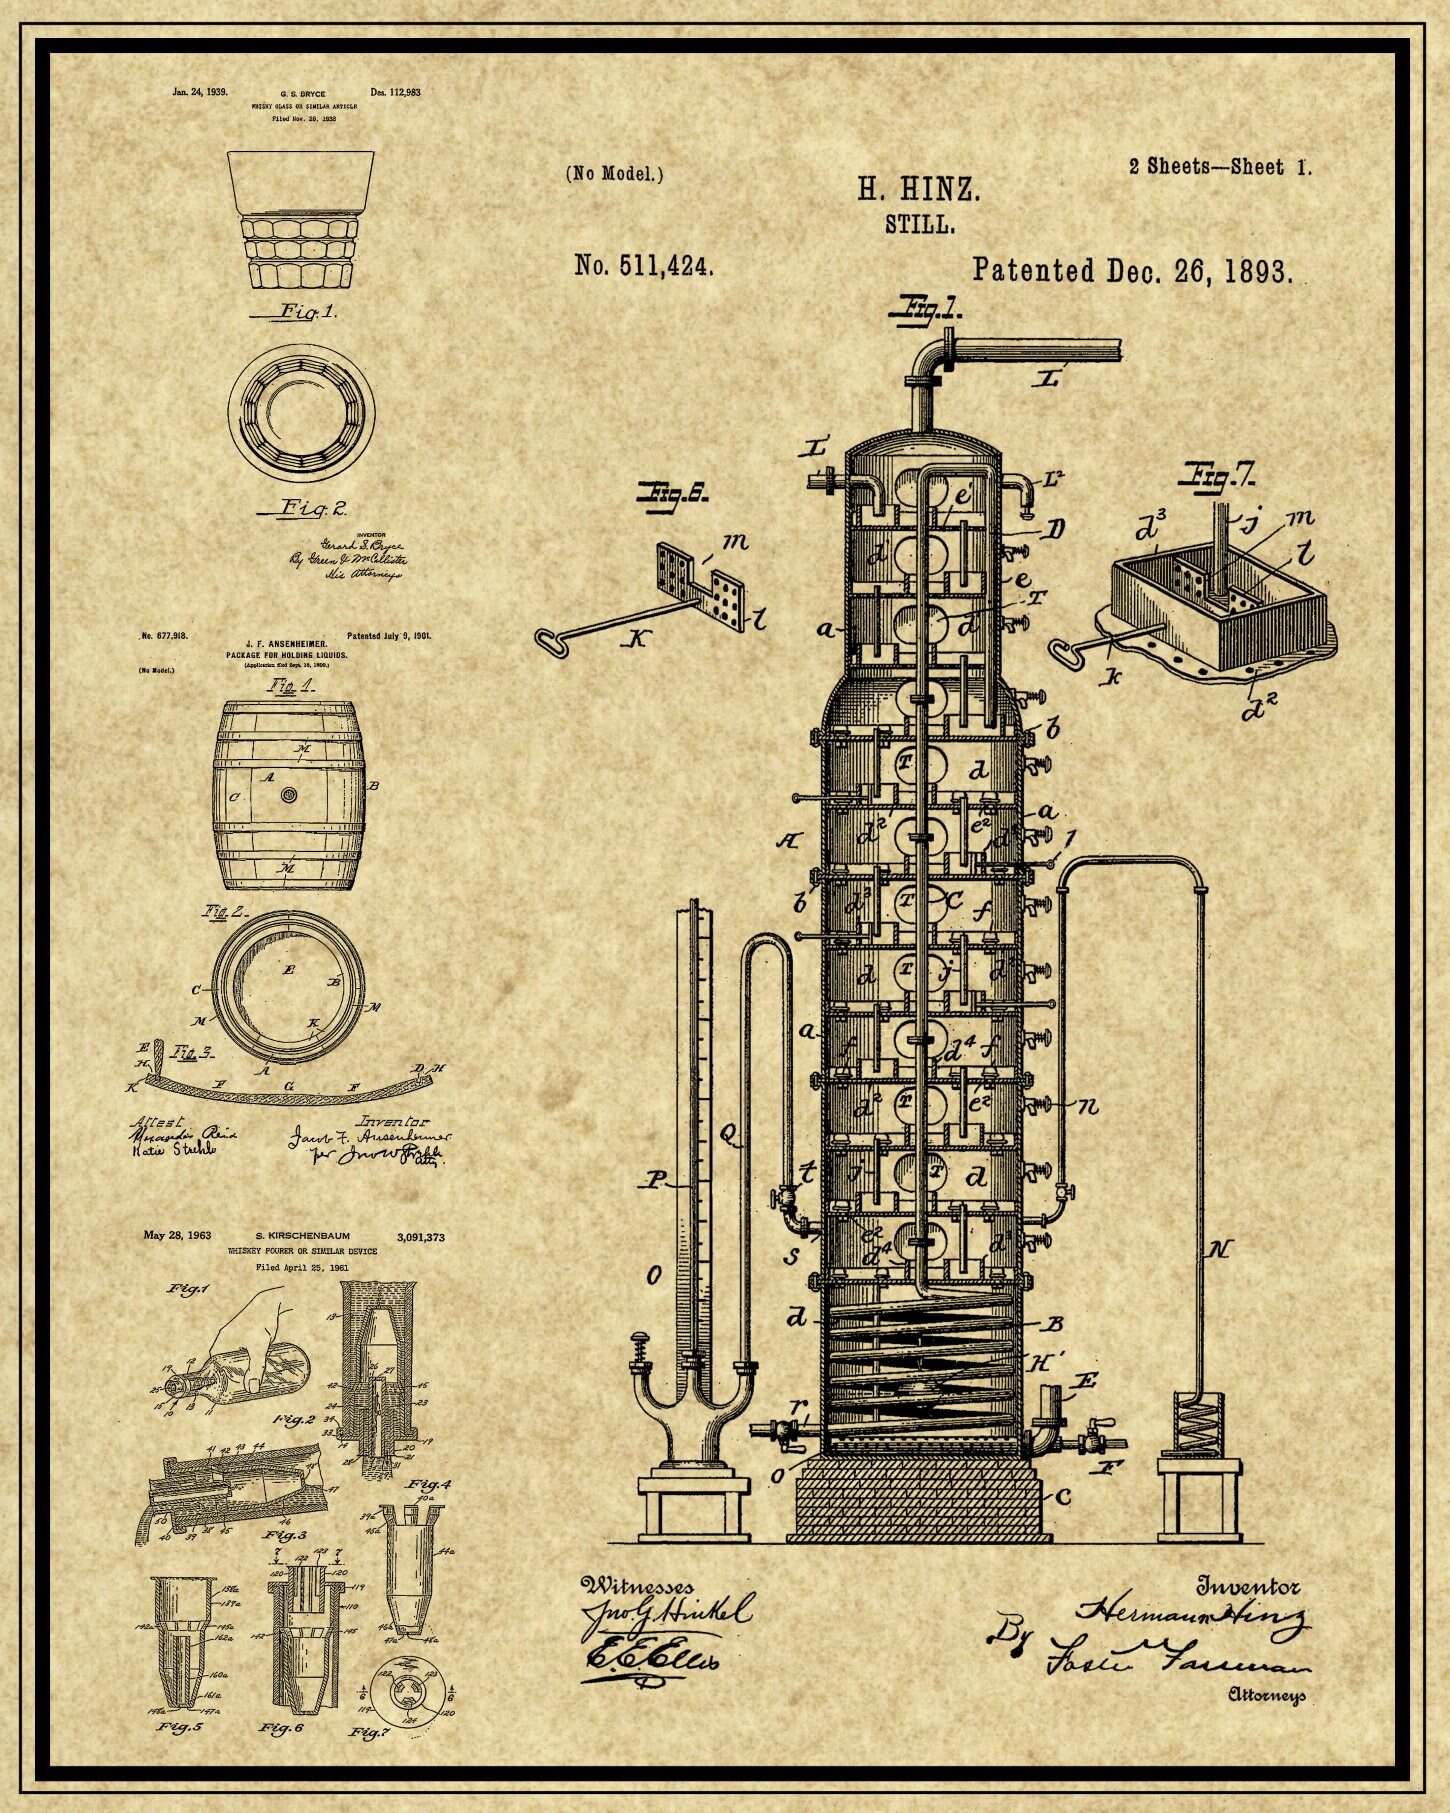 Whiskey Patent Print Downloadable Prints Vintage Whiskey